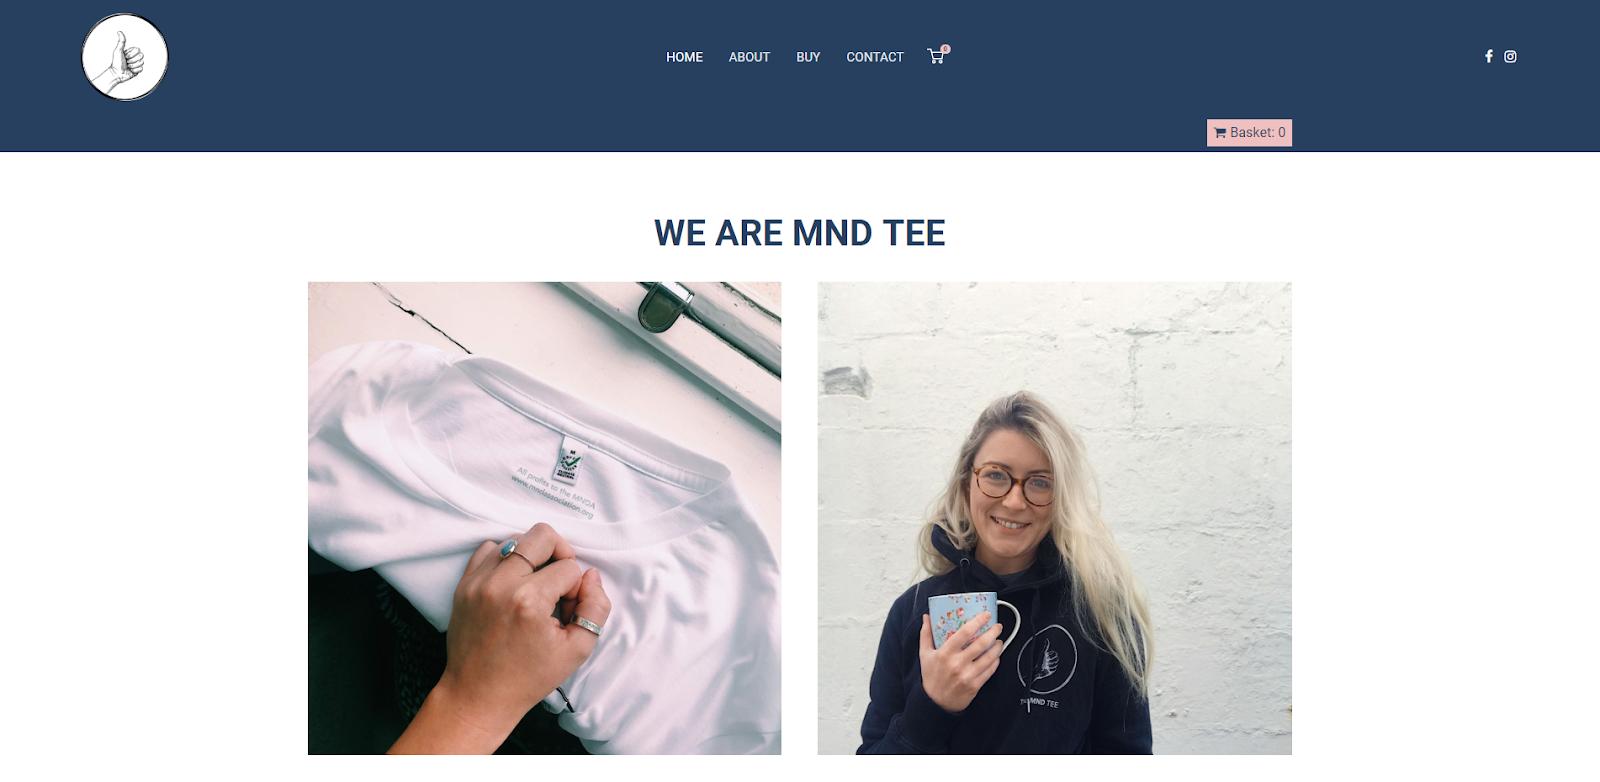 Screenshot of MND Tee website]